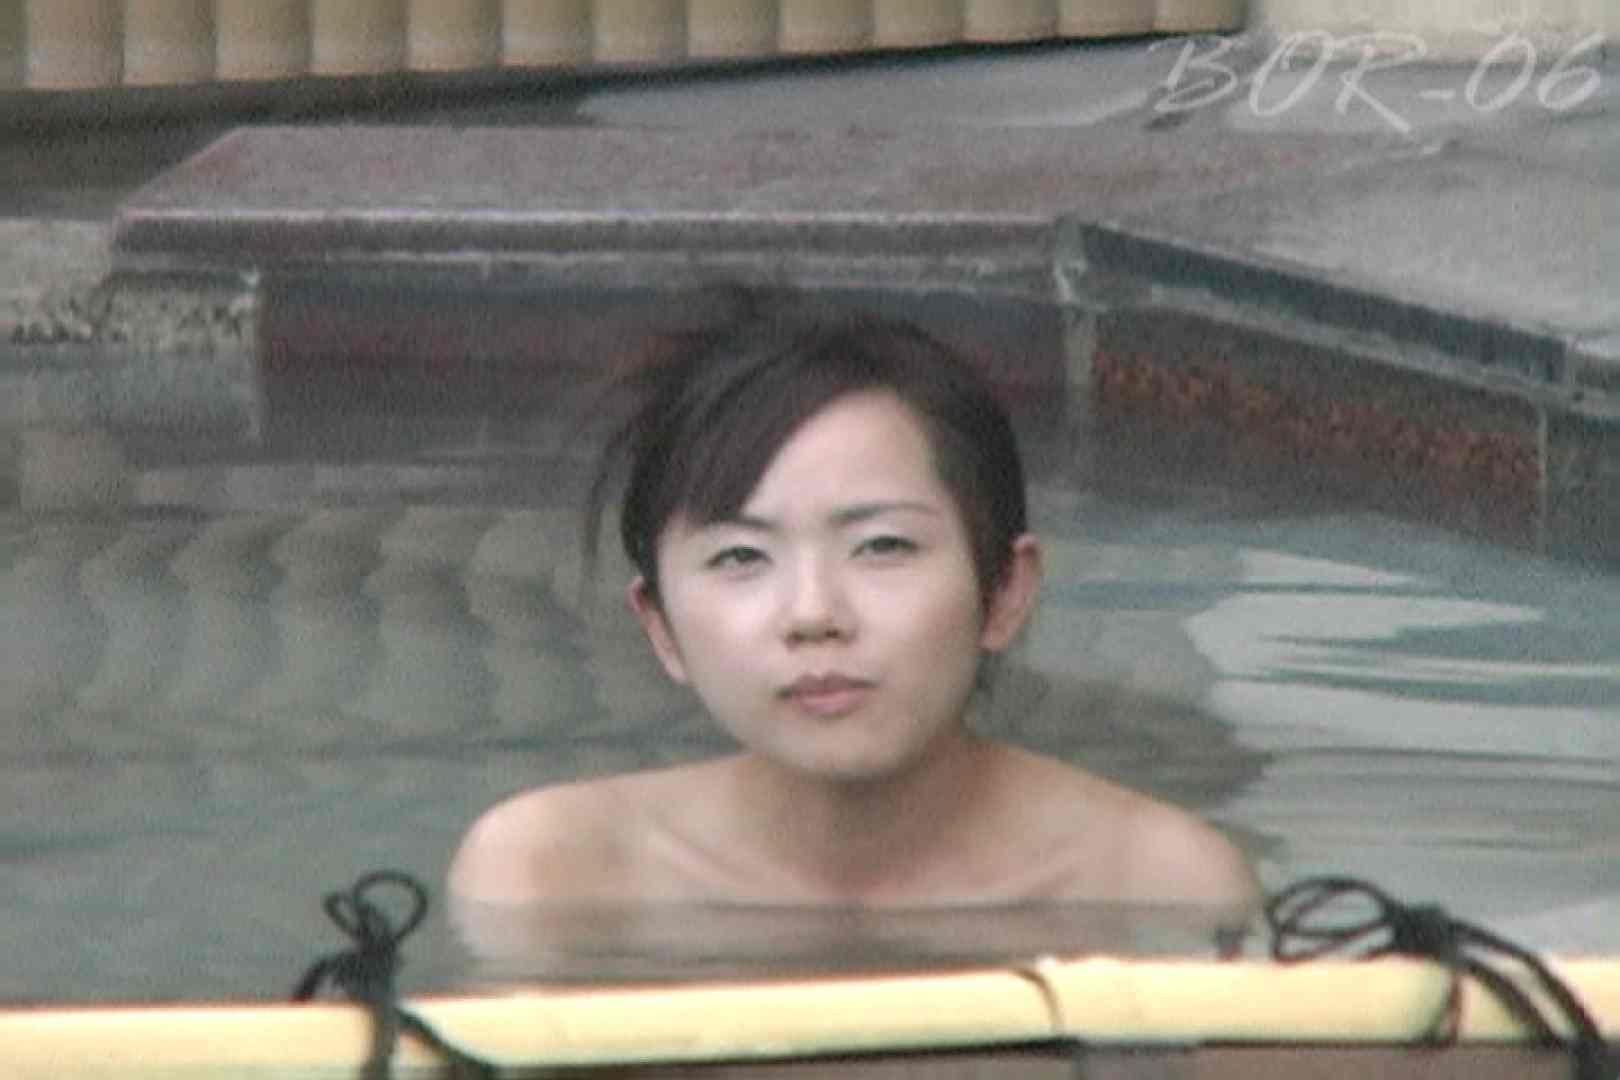 Aquaな露天風呂Vol.521 OLセックス  92画像 45